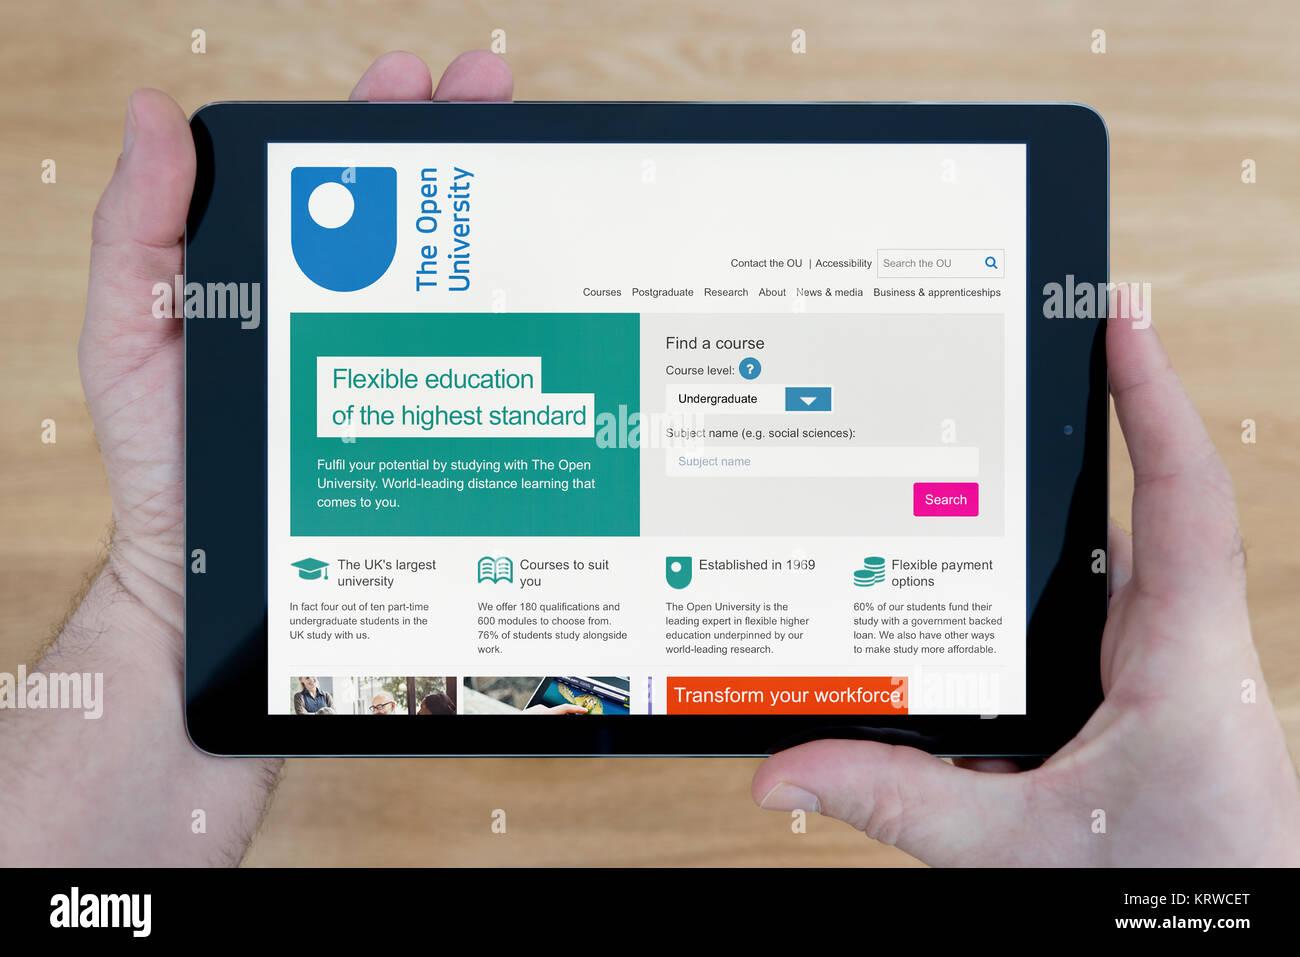 Exterior Home Design App For Ipad The Open University Stock Photos Amp The Open University